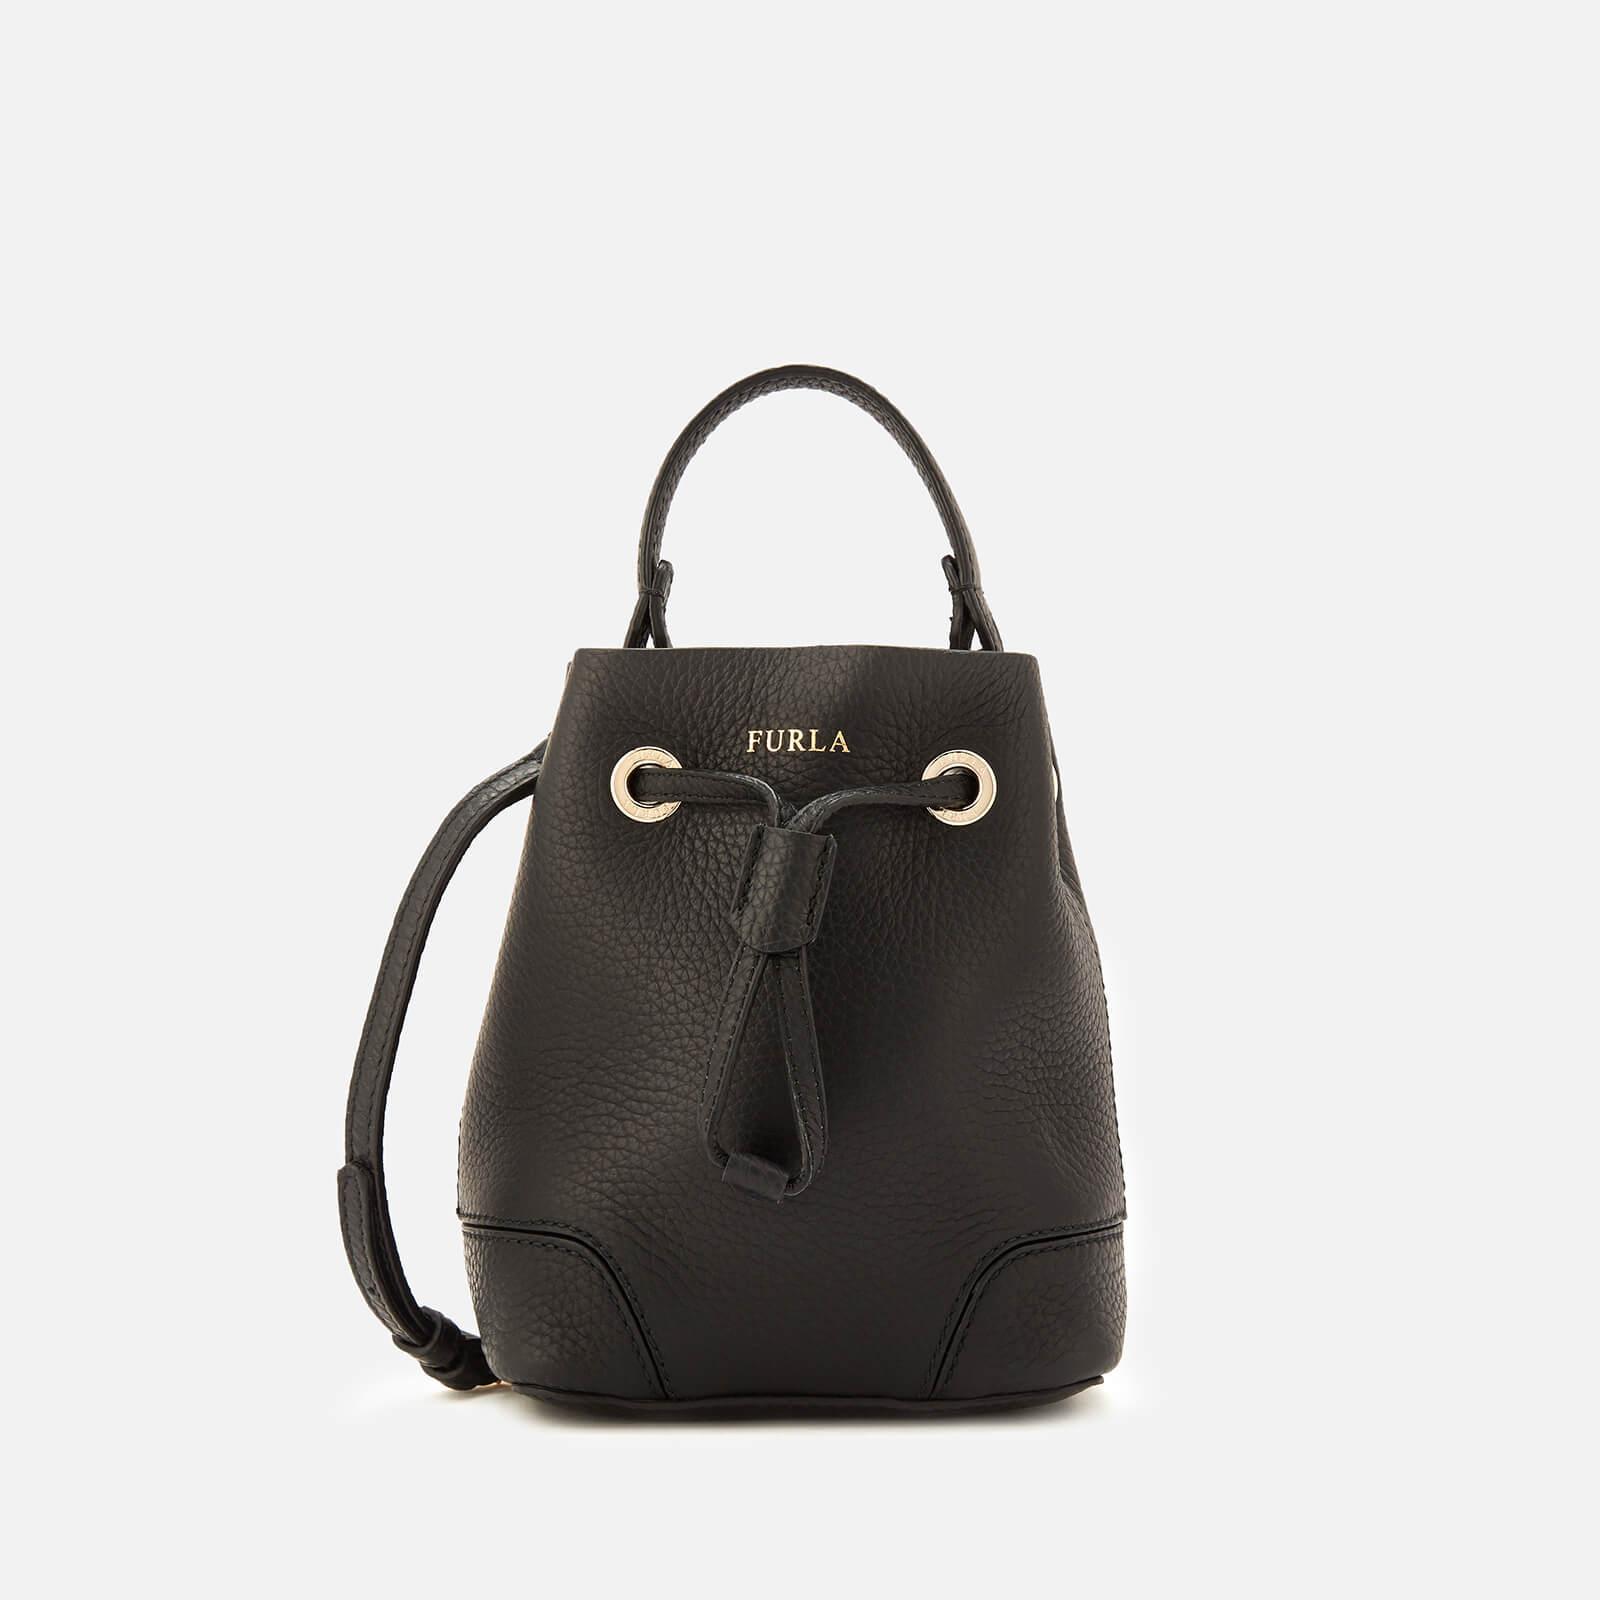 12099b1775c38 Lyst - Furla Stacy Mini Drawstring Bag in Black